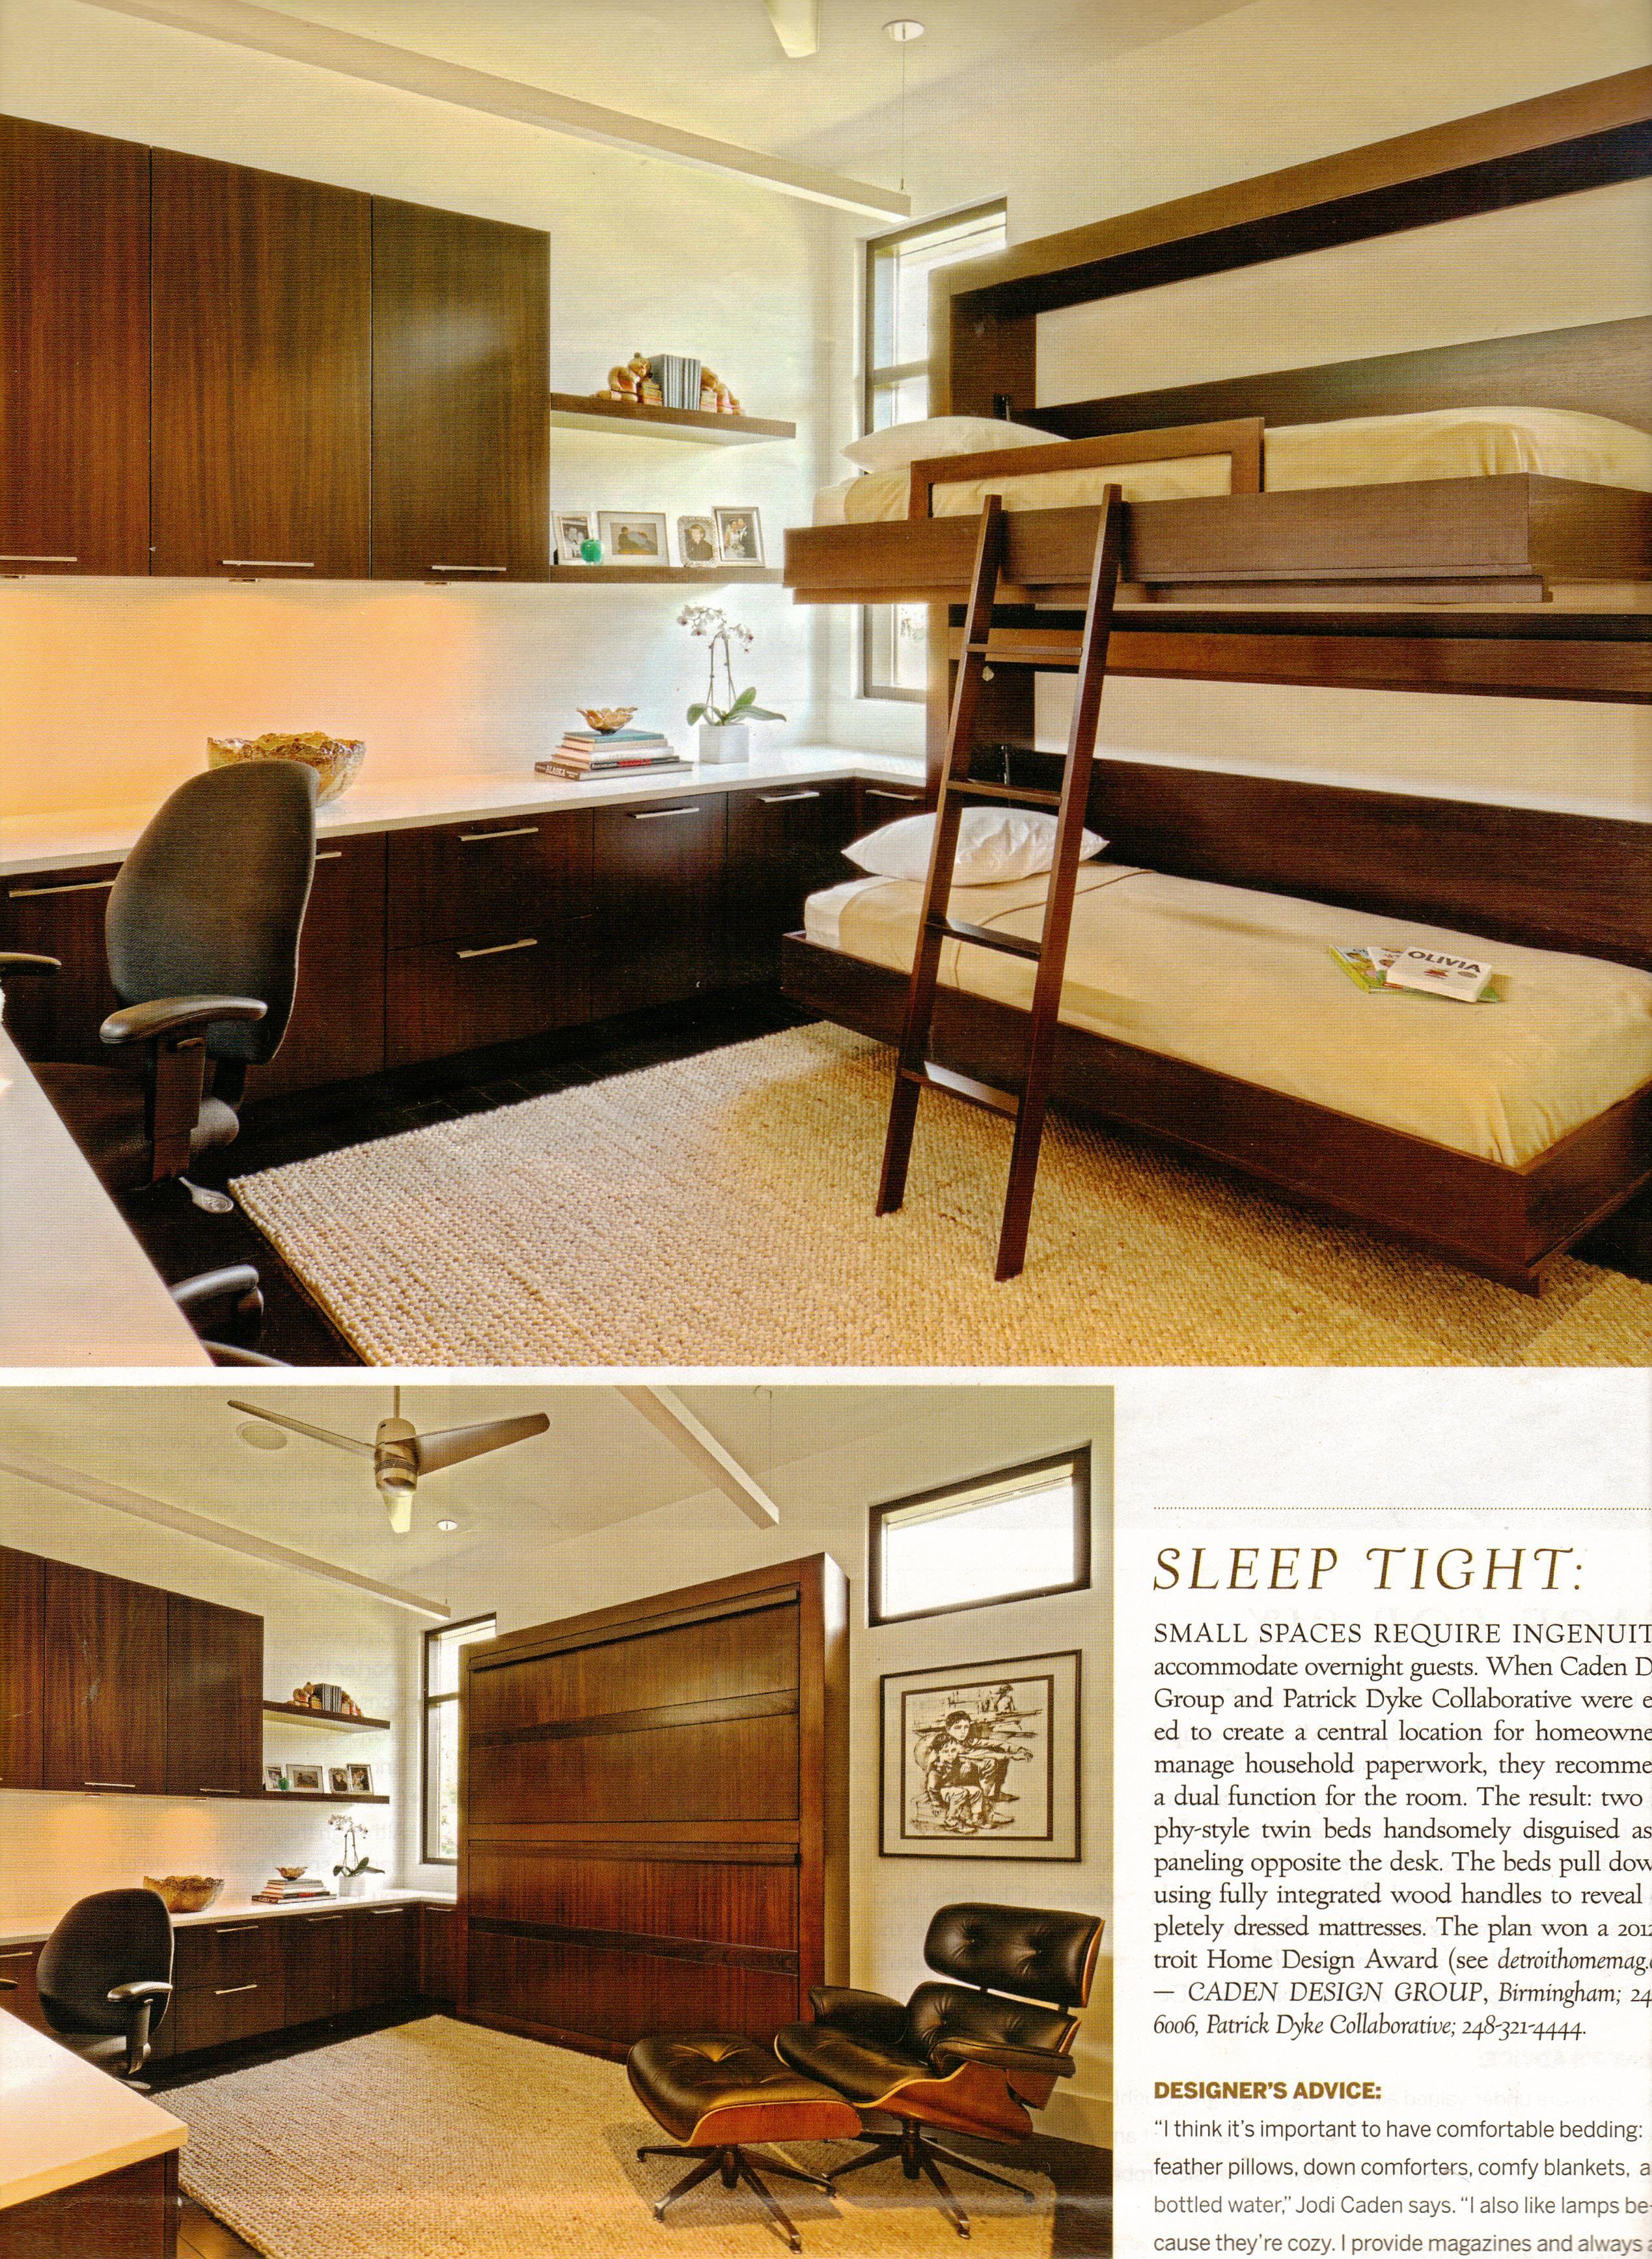 office idealove the murphy bunk beds for guests Murphy